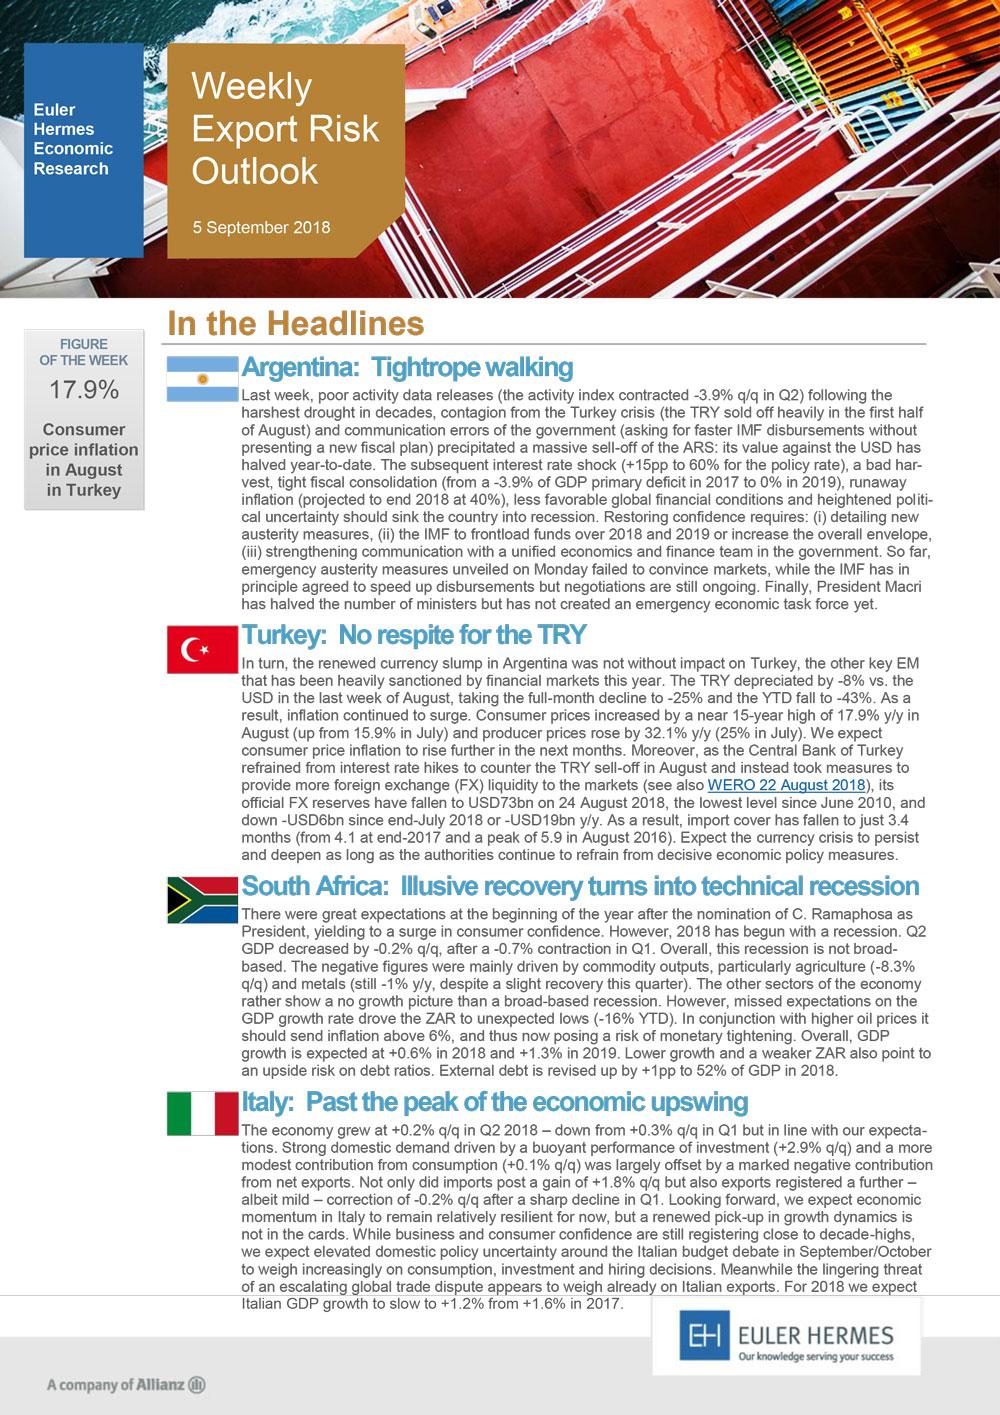 Weekly Export Risk Outlook 05/09/2018